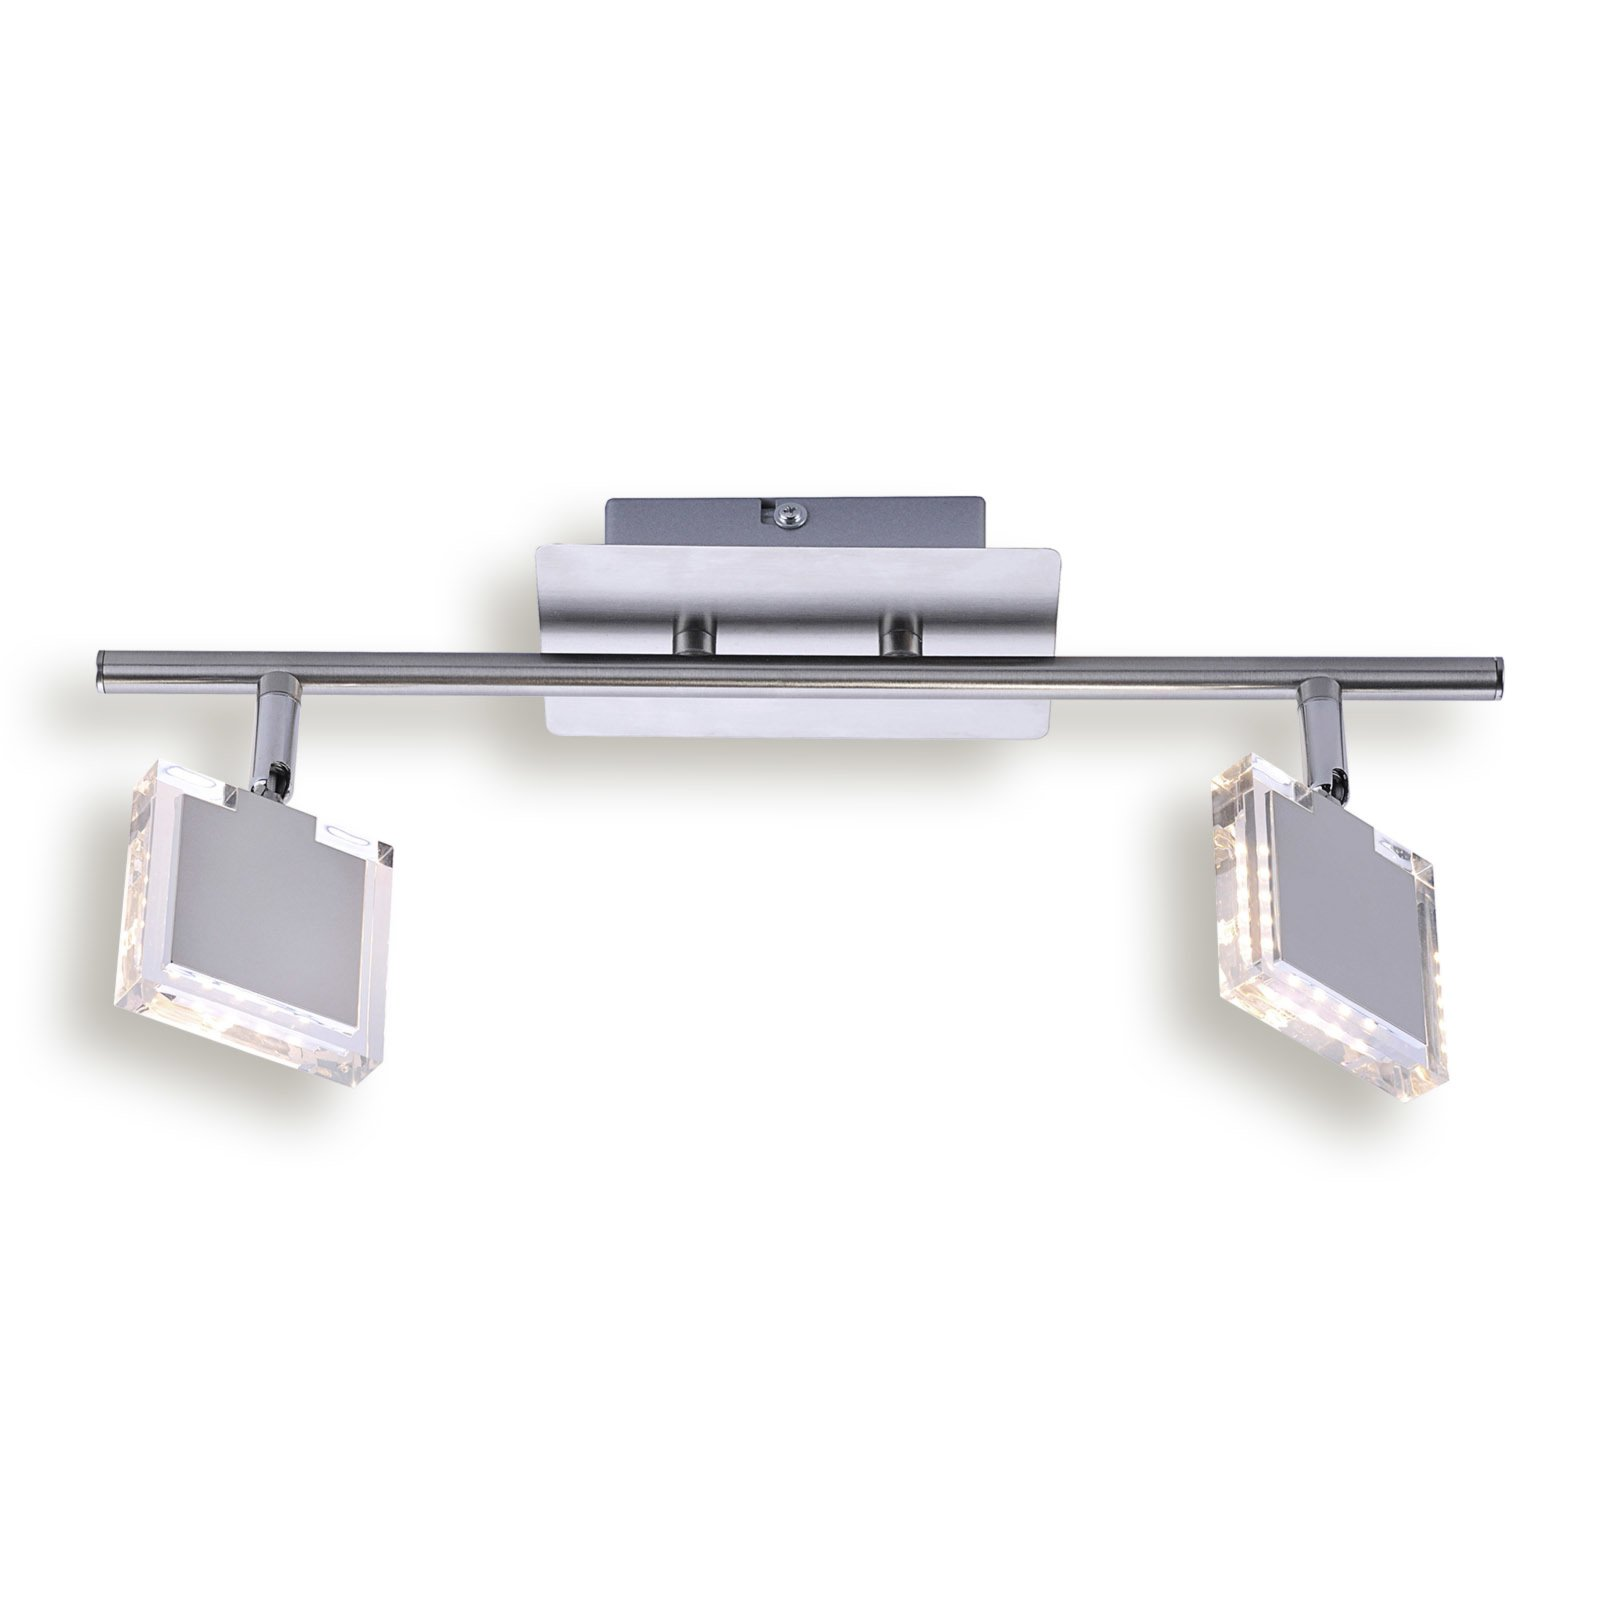 led deckenstrahler tony alufarben 2 flammig deckenstrahler deckenleuchten lampen. Black Bedroom Furniture Sets. Home Design Ideas